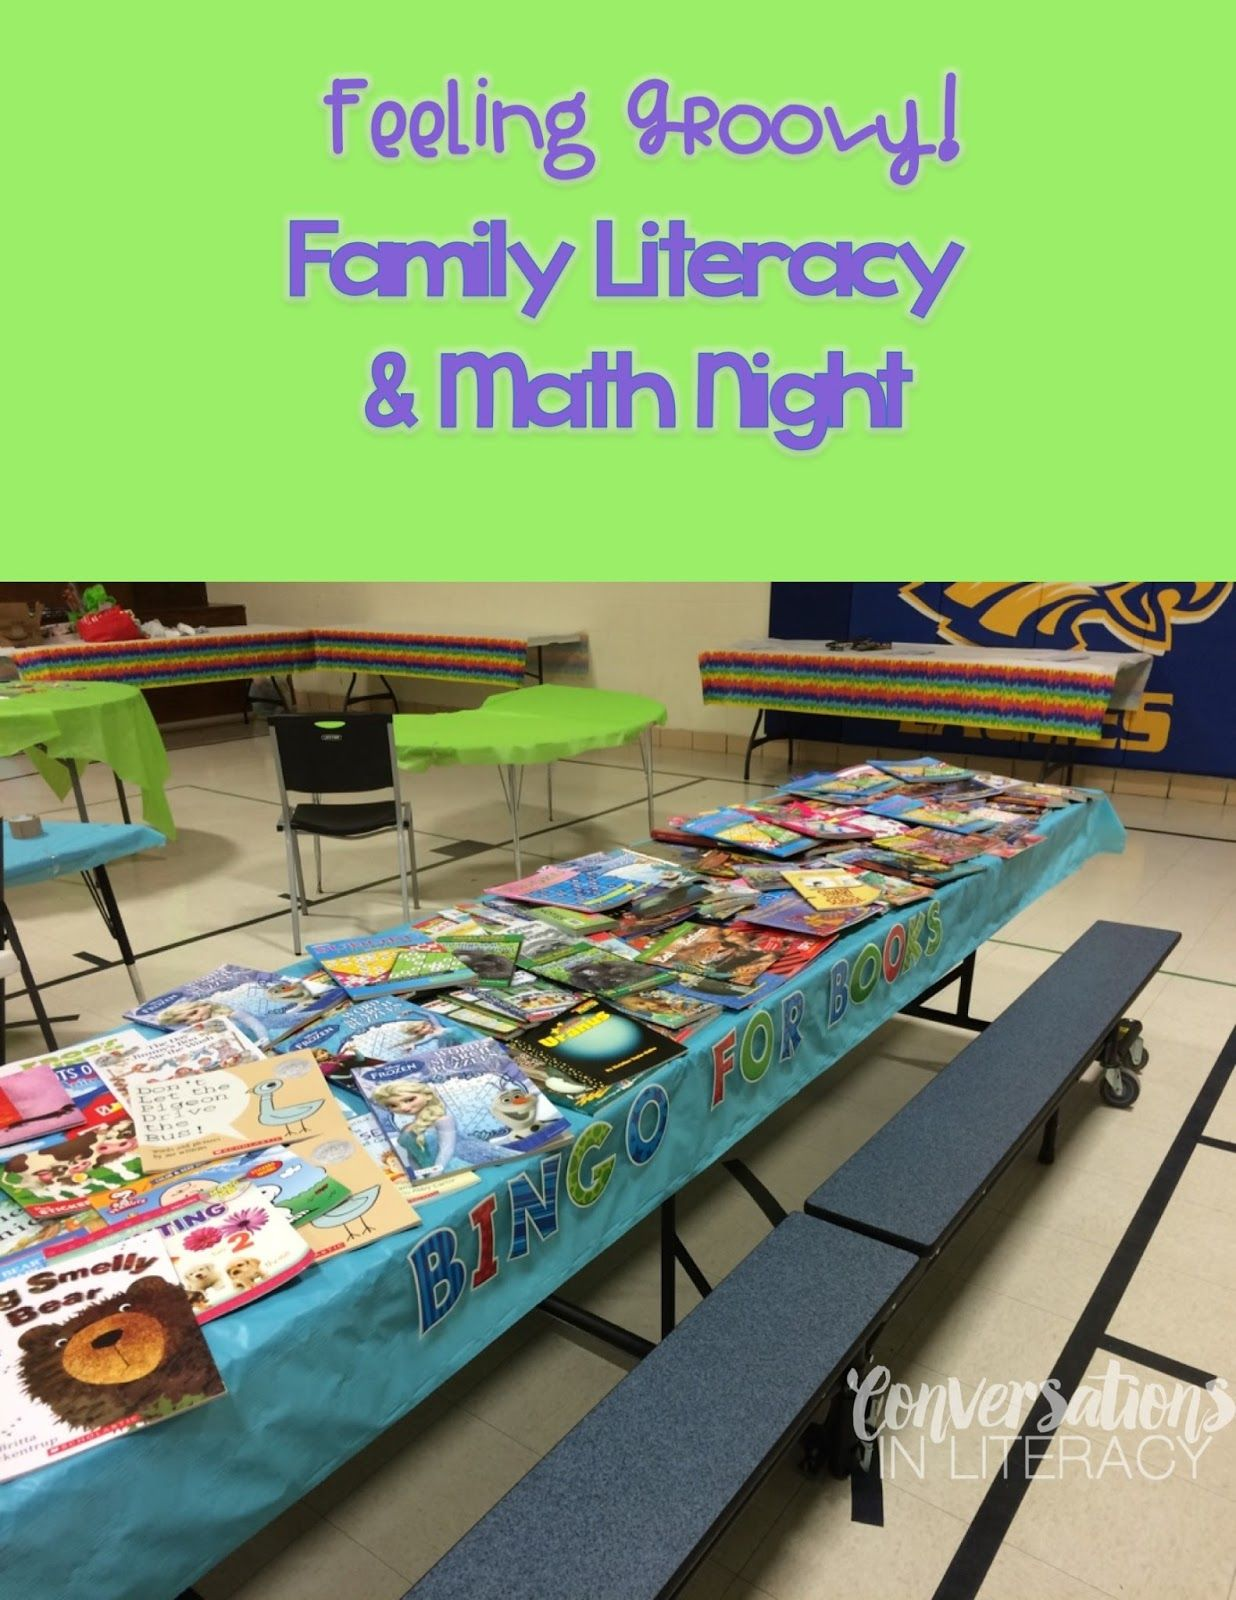 feeling groovy on family literacy night! | book fair | pinterest